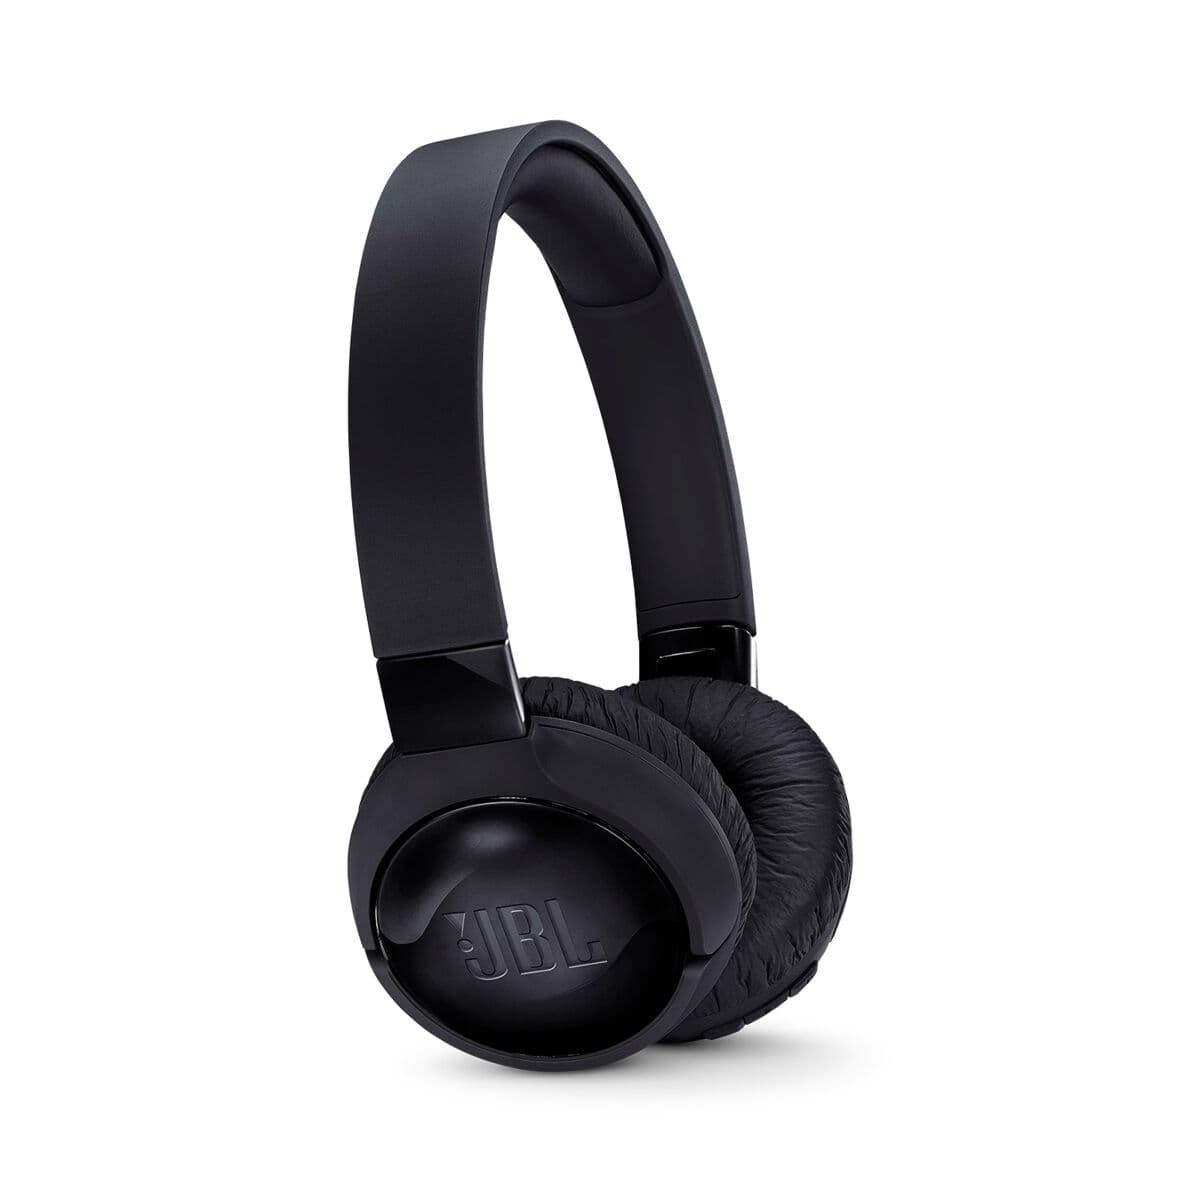 JBL TUNE 600BTNC - Noir Casque On-Ear